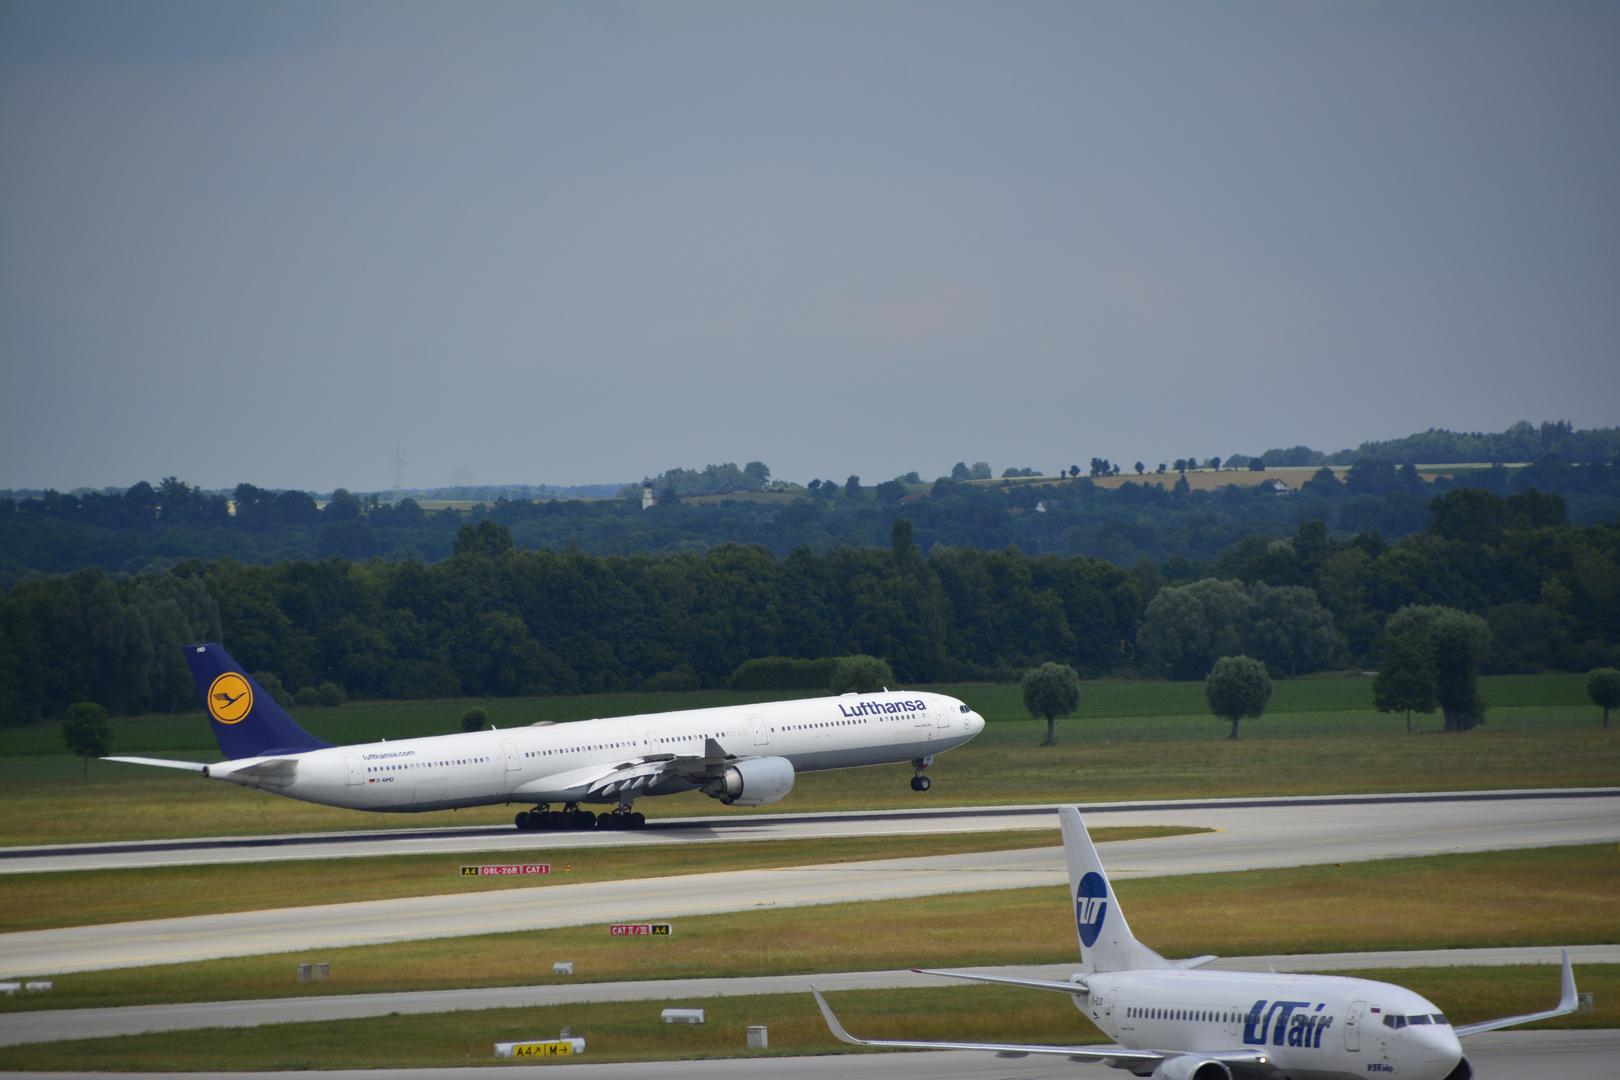 Airbus A340-600 der Lufthansa